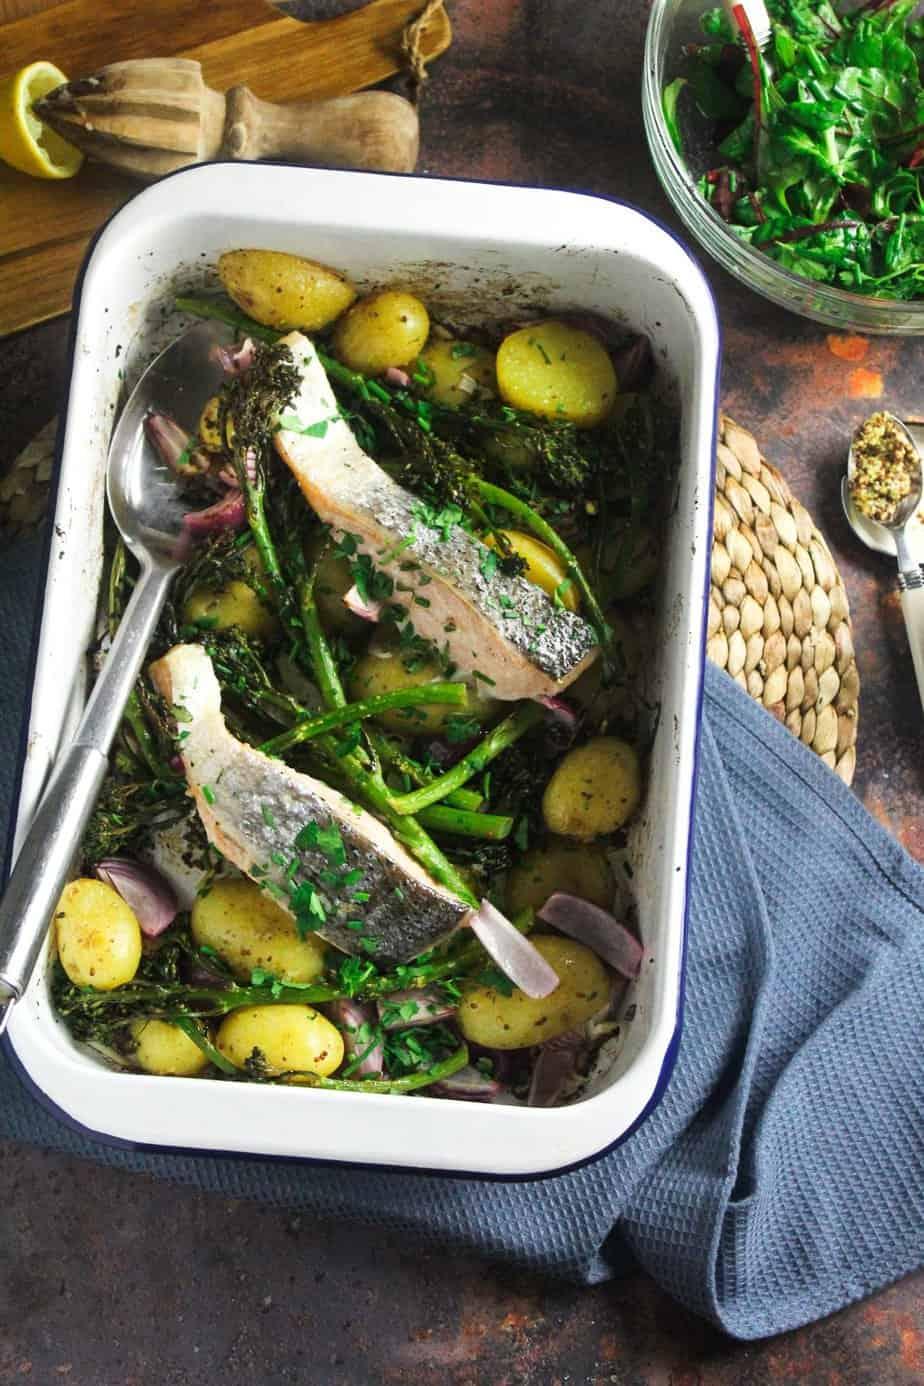 Salmon, Potato and Broccoli Traybake with Wholegrain Mustard